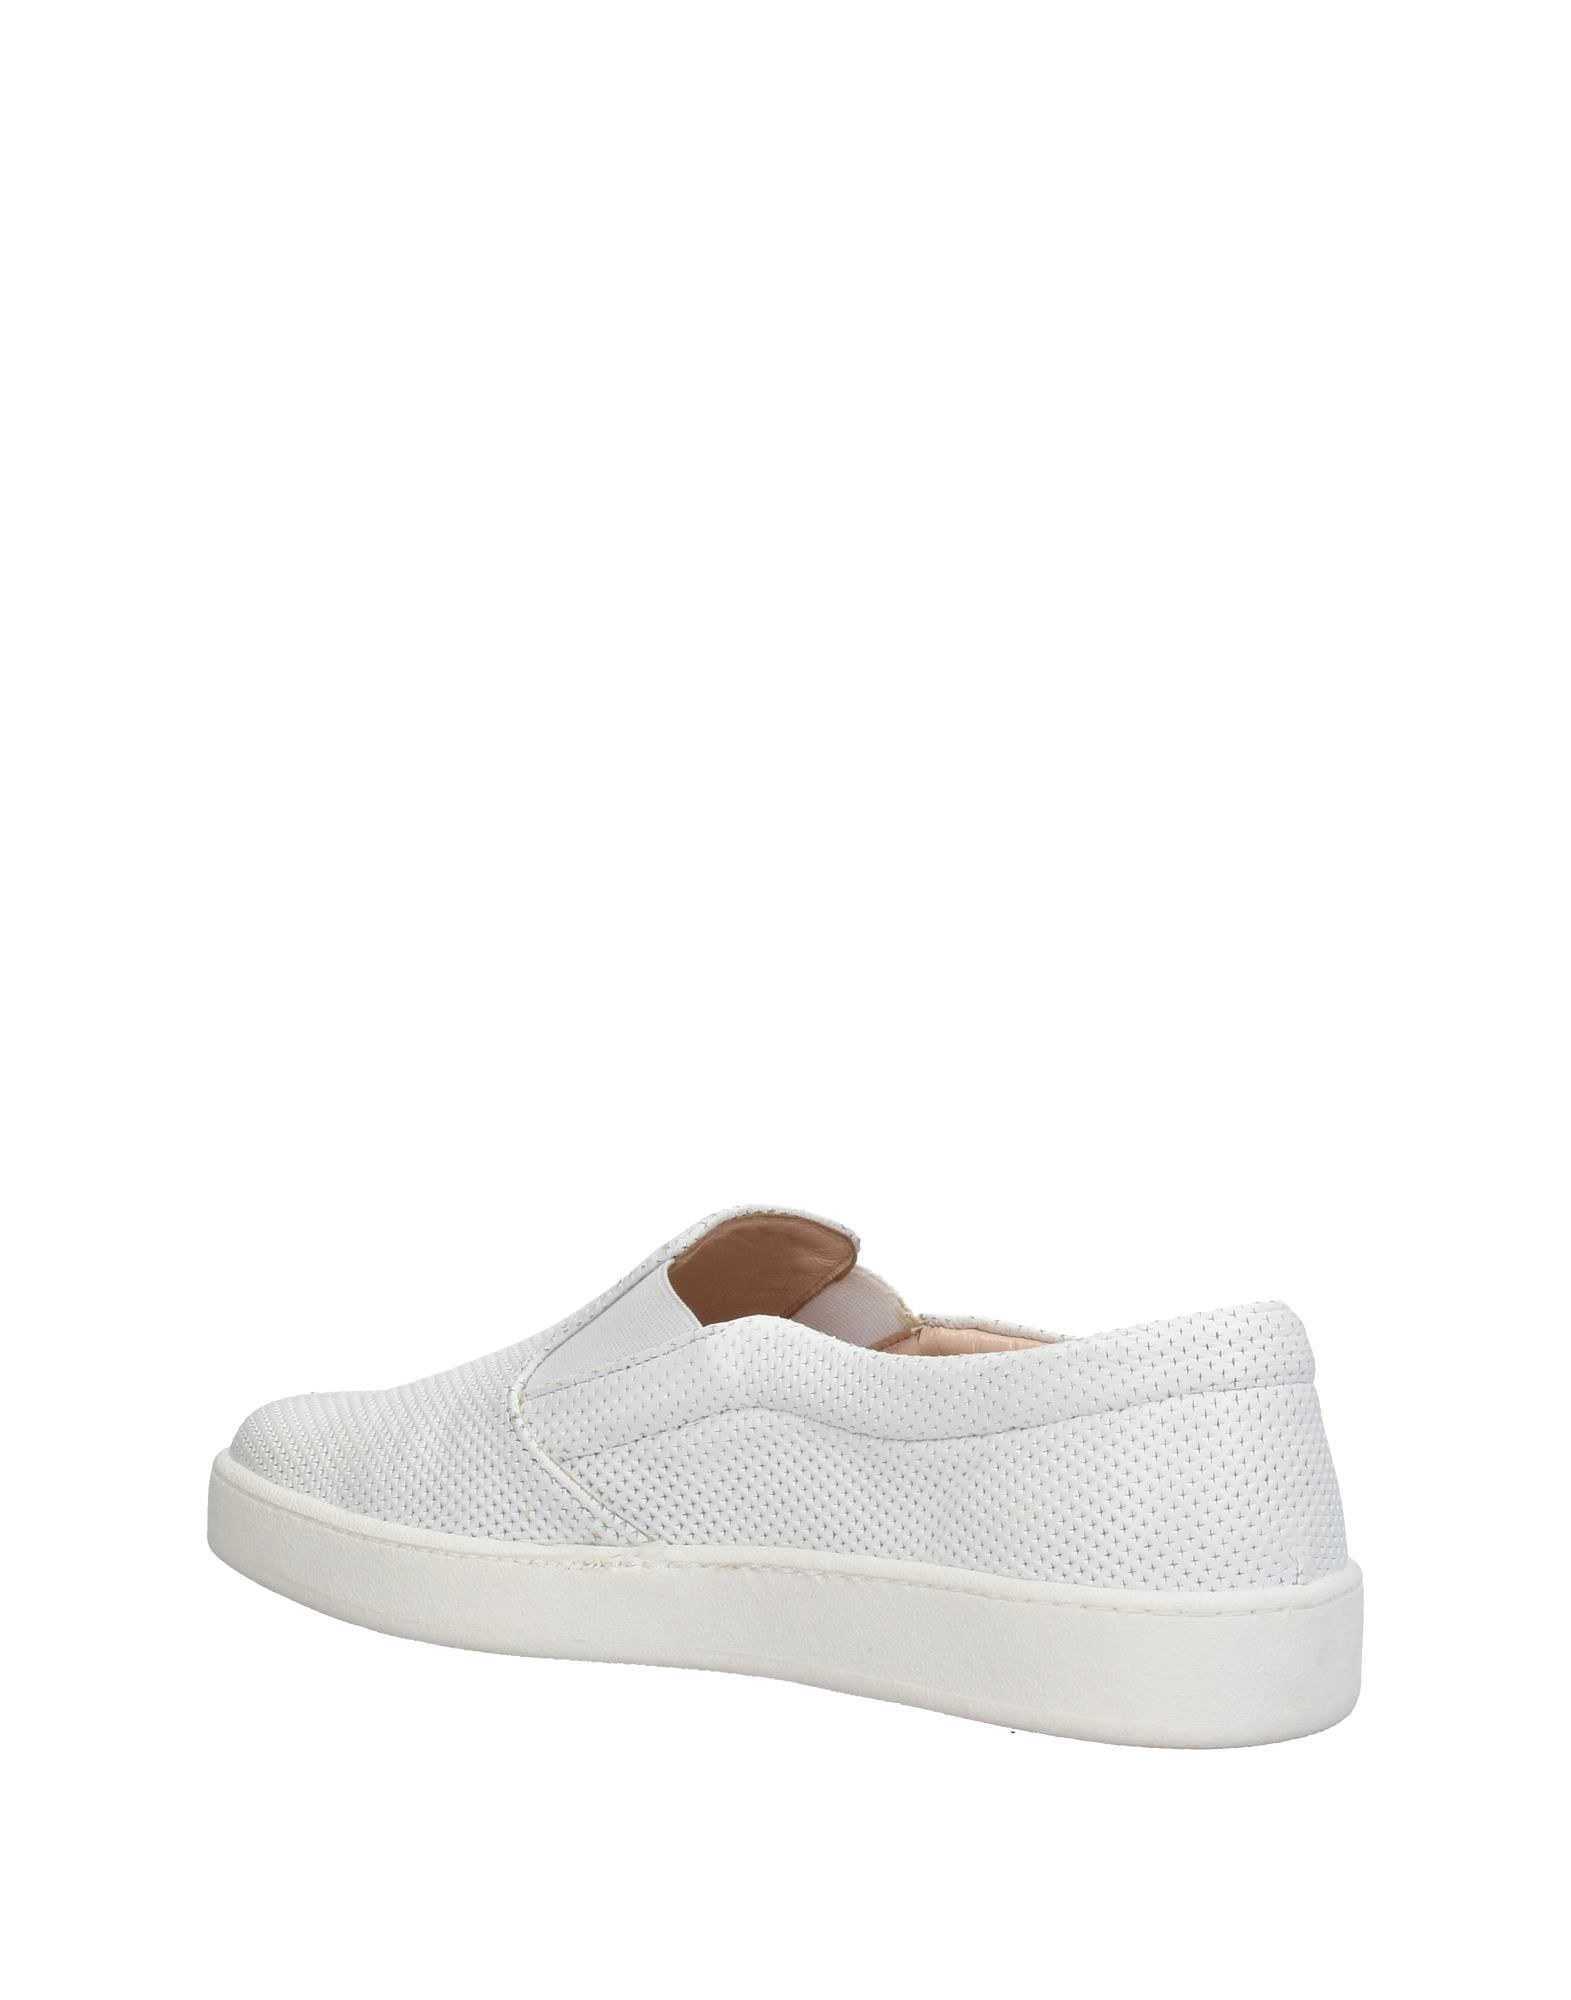 Carlo Pazolini White Leather Slip Ons